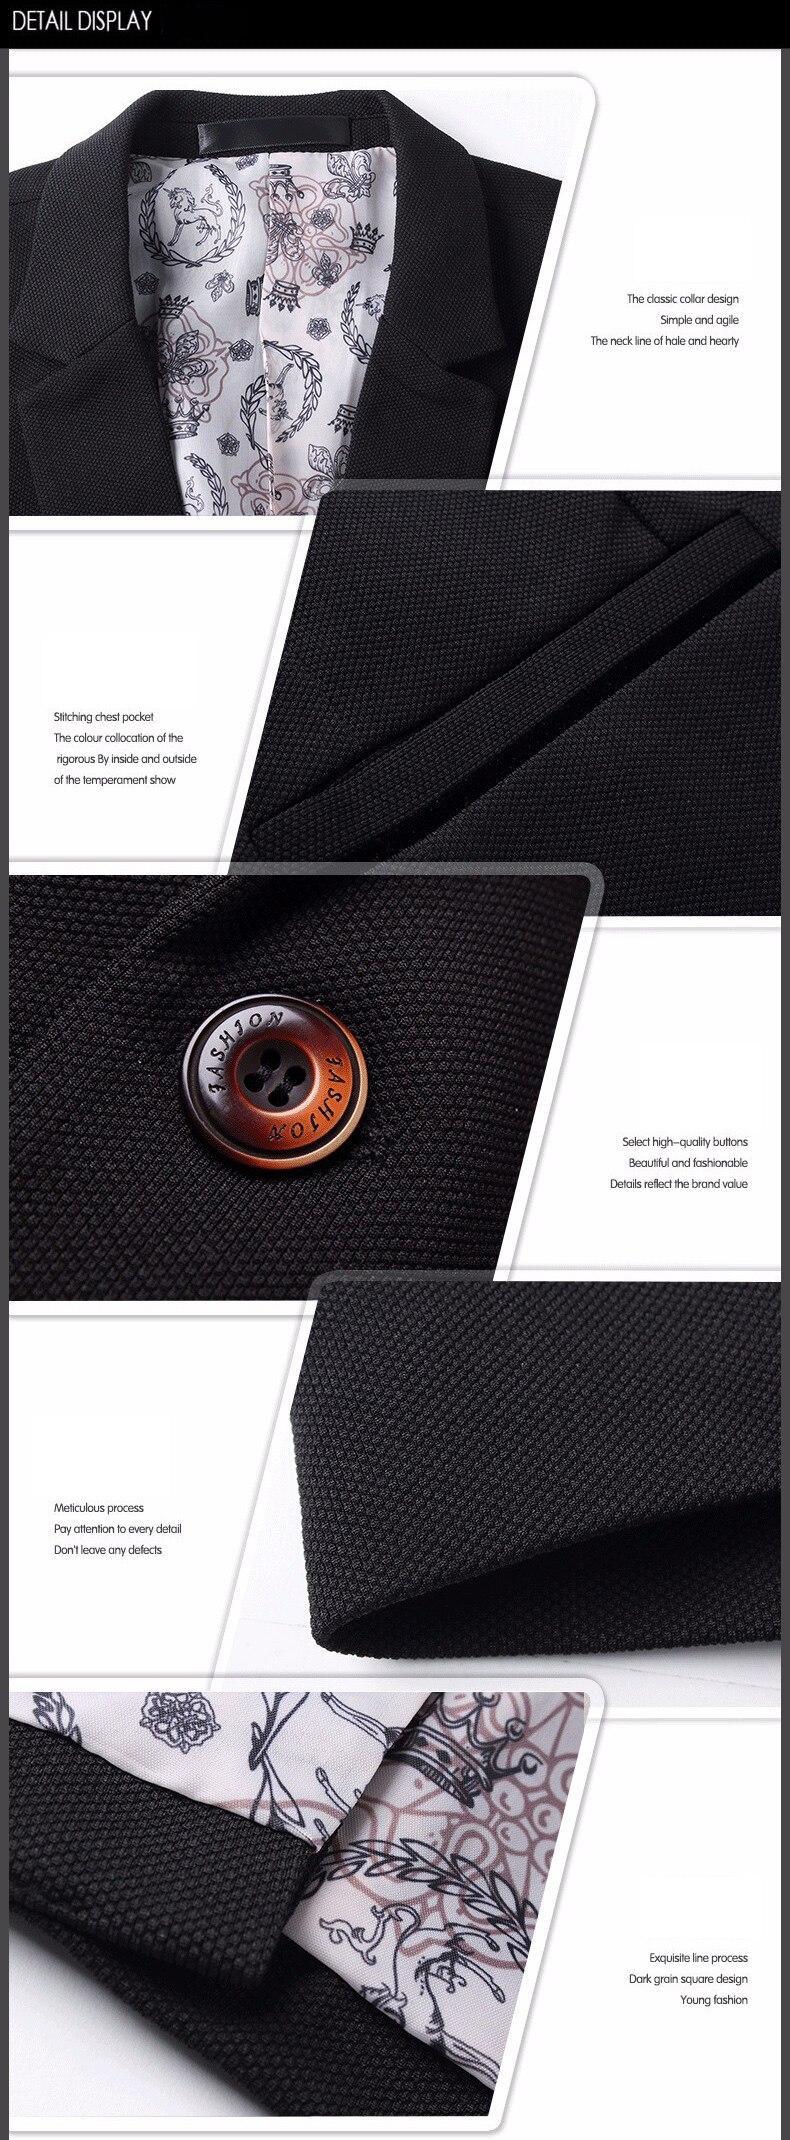 HTB1Uu6xRpXXXXXmXFXXq6xXFXXXF - HCXY модные Для мужчин Блейзер Повседневные комплекты одежды Slim Fit пиджак Для мужчин весна костюм Homme, TERNO masculin Блейзер, куртка